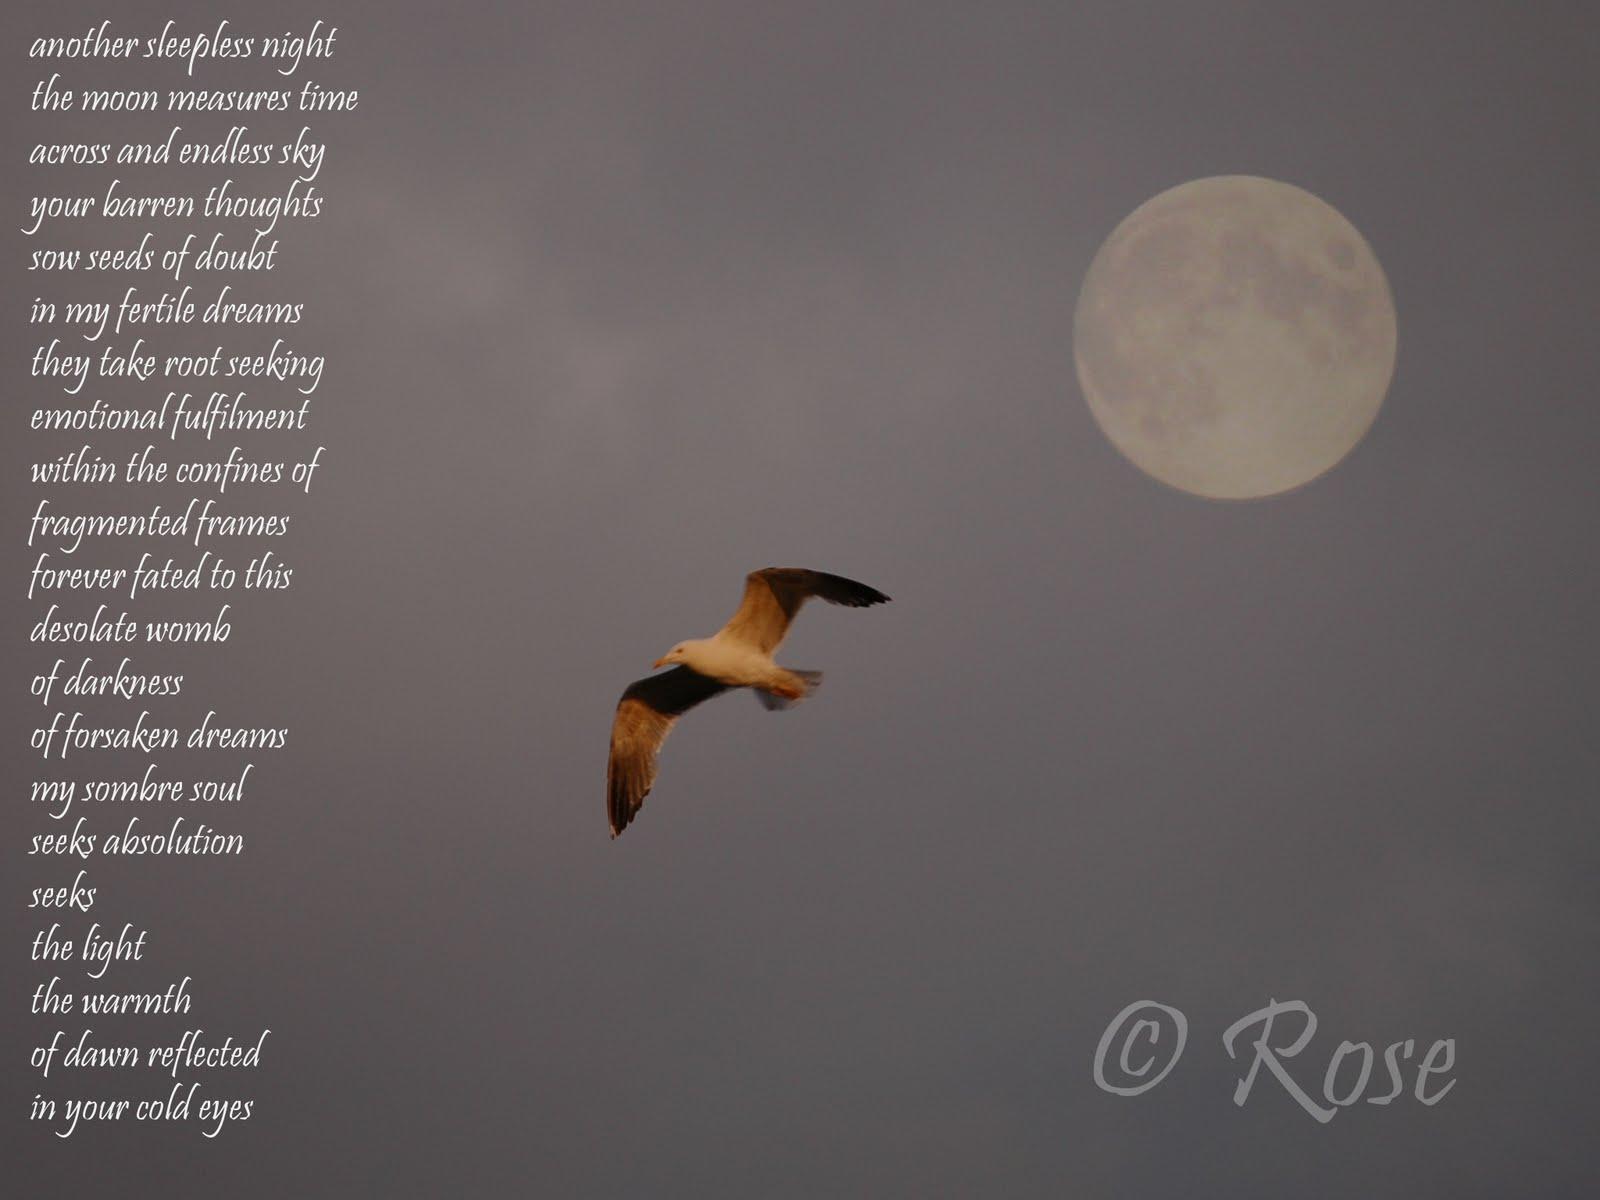 Another Sleepless Night Lyrics